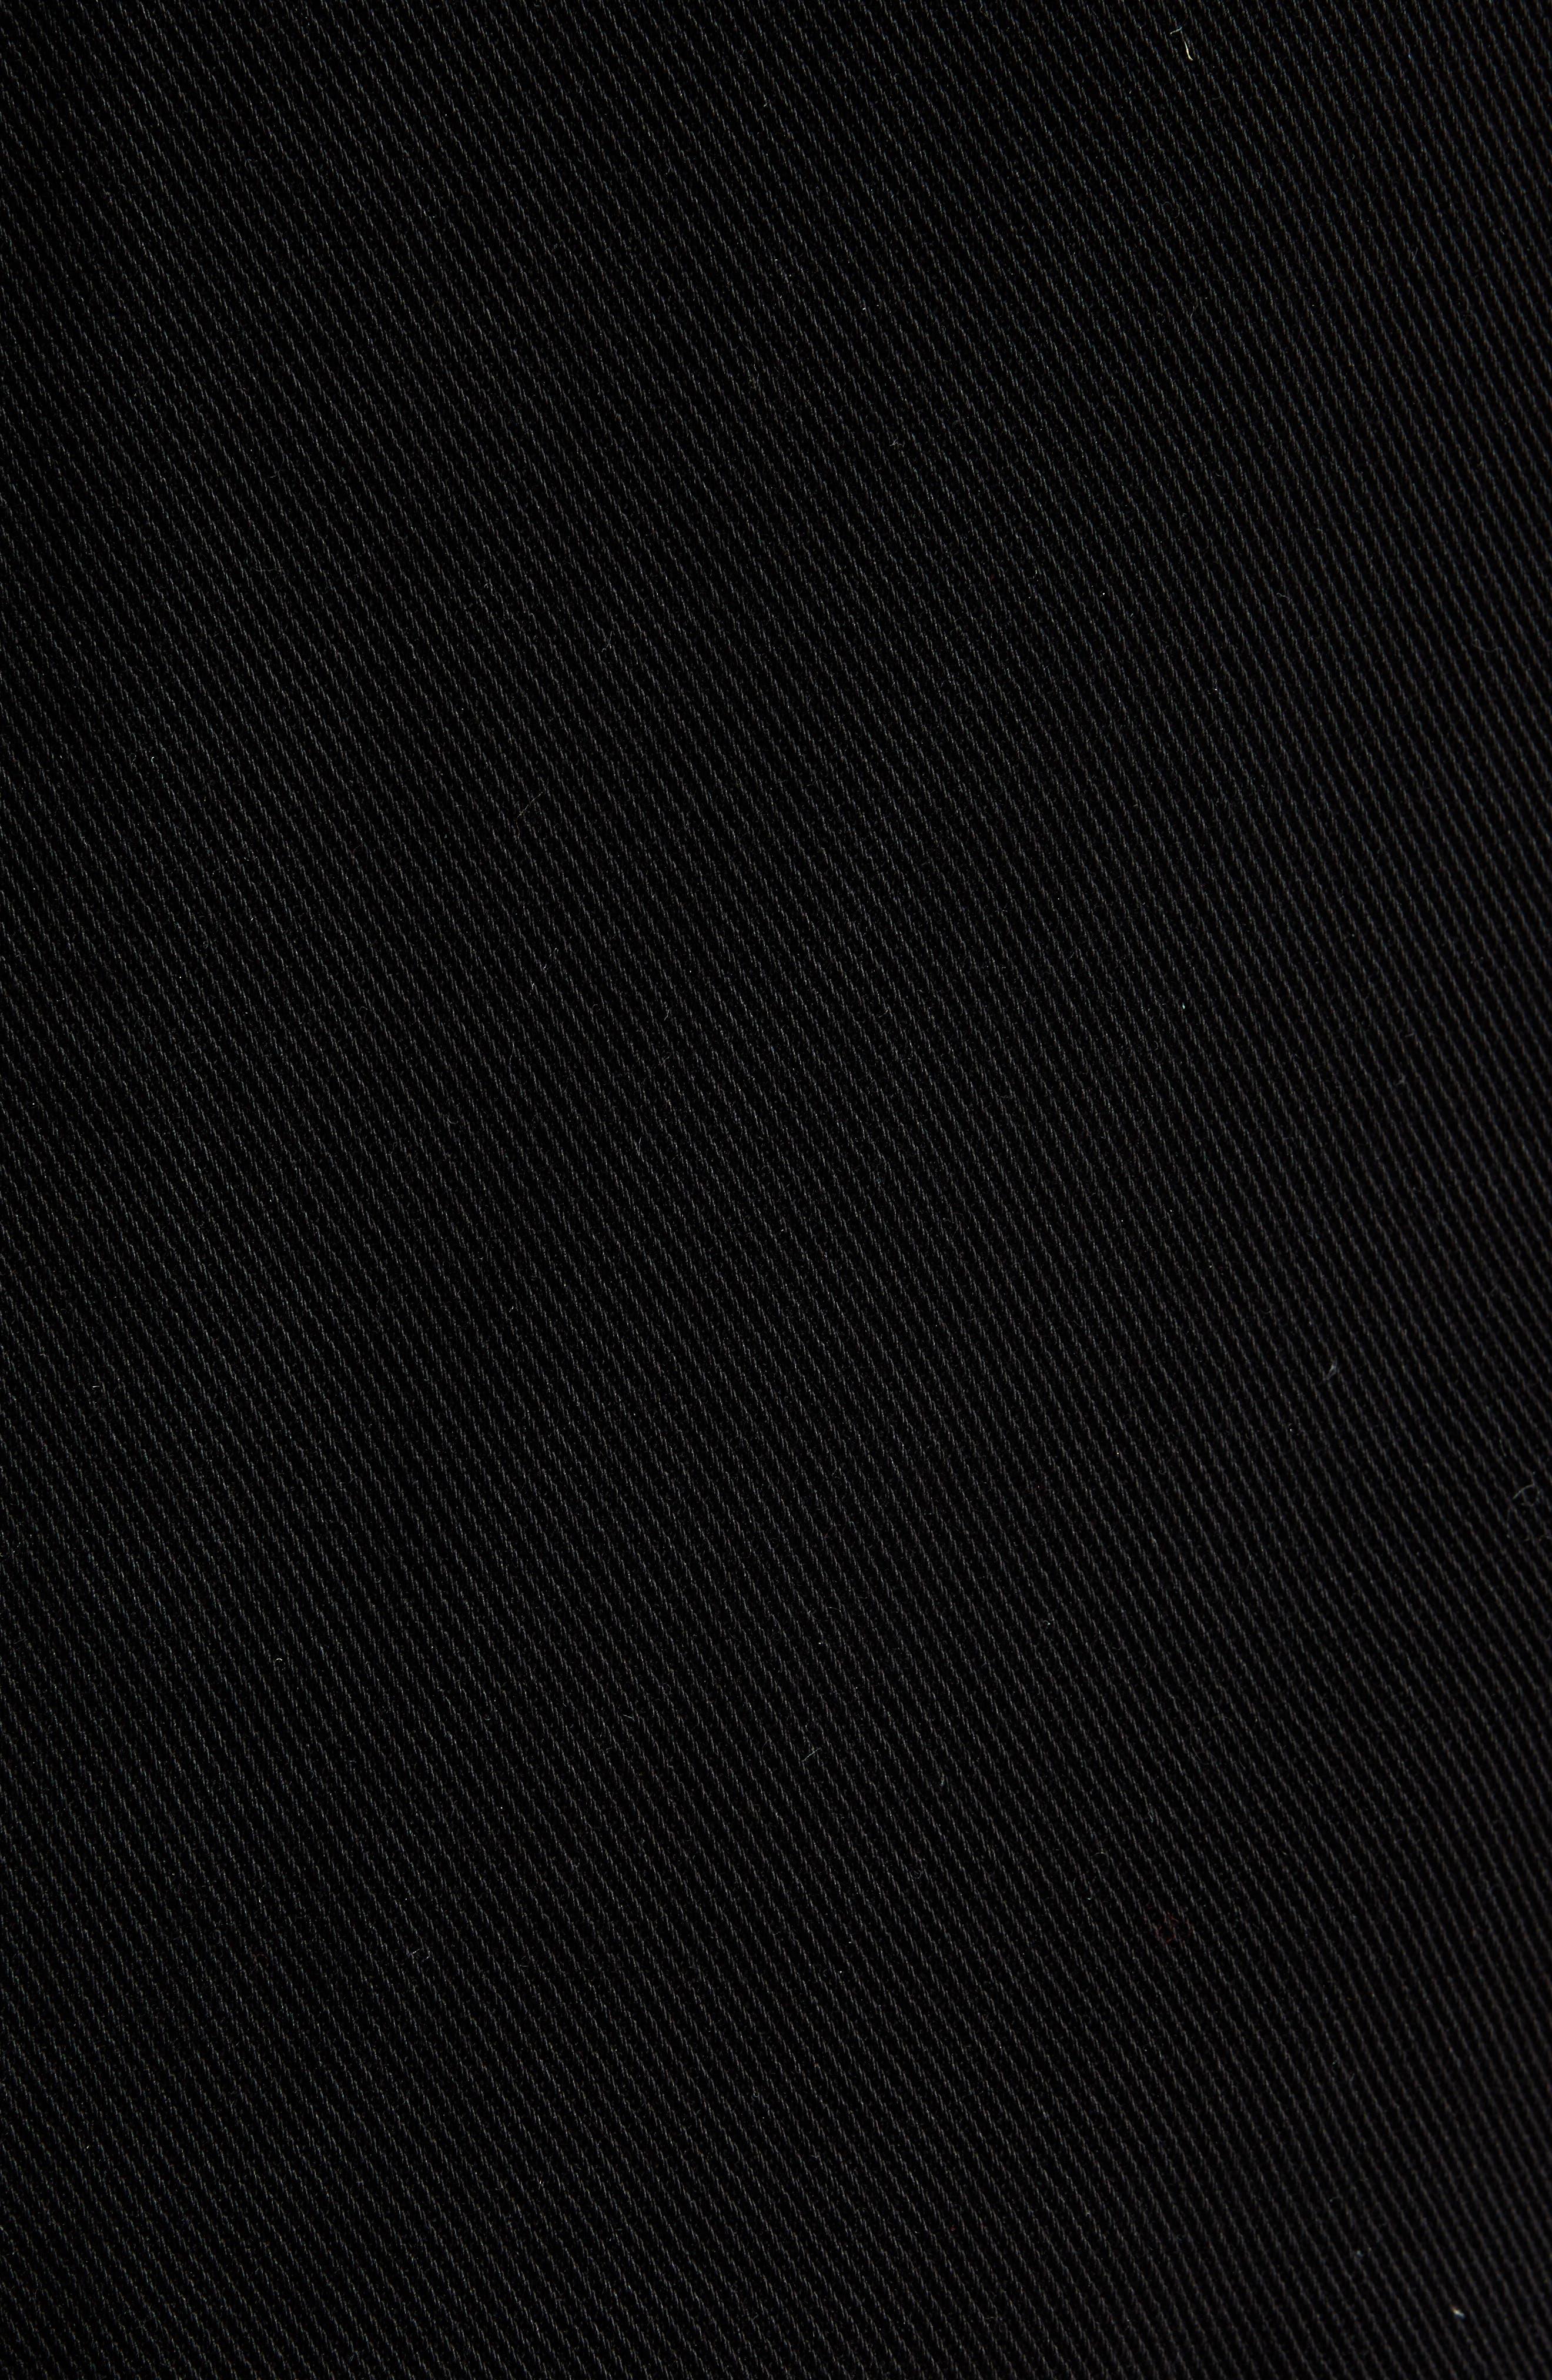 Mickey Mouse Unisex Denim Jacket,                             Alternate thumbnail 7, color,                             001